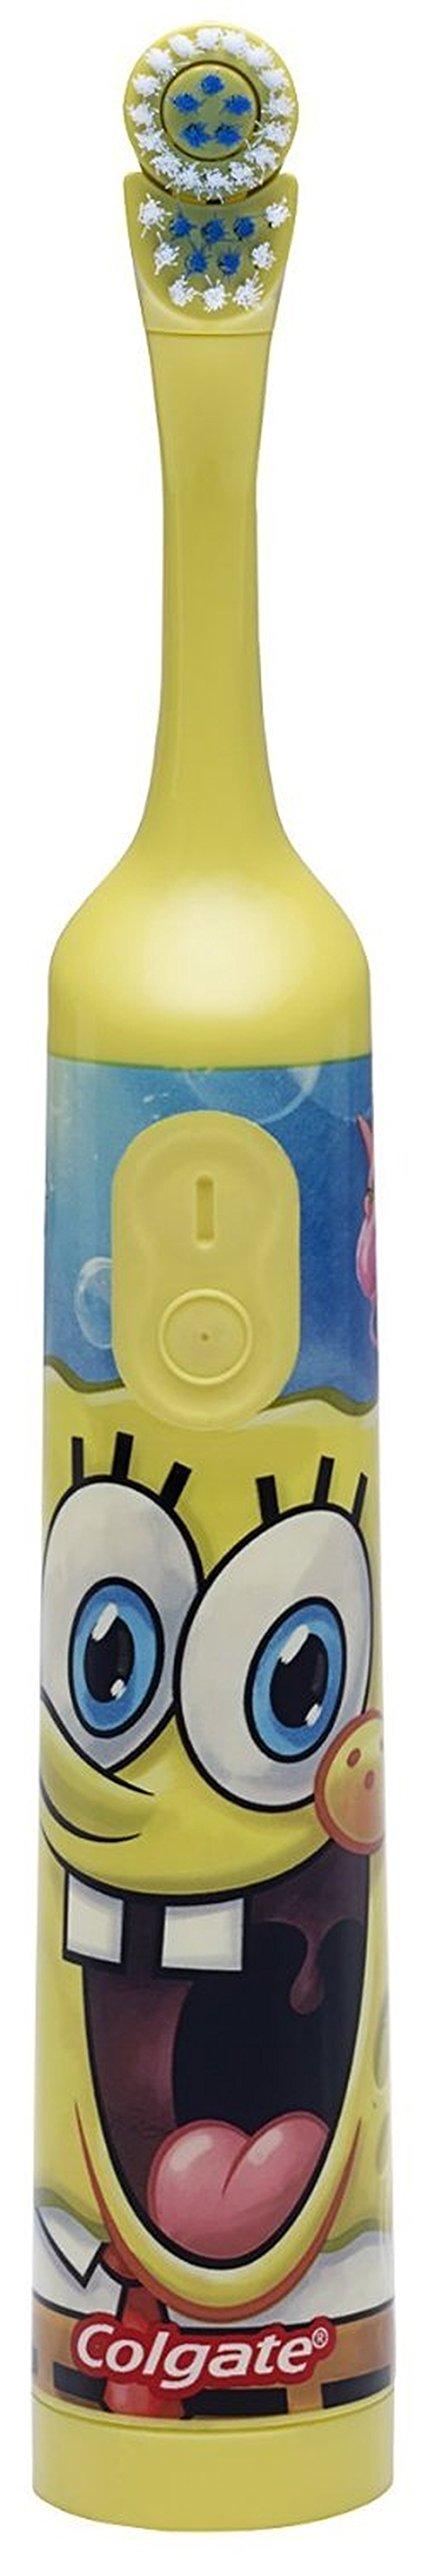 Colgate Nickelodeon SpongeBob SquarePants Extra Soft Powered Toothbrush, 1 CT (Pack of 3)